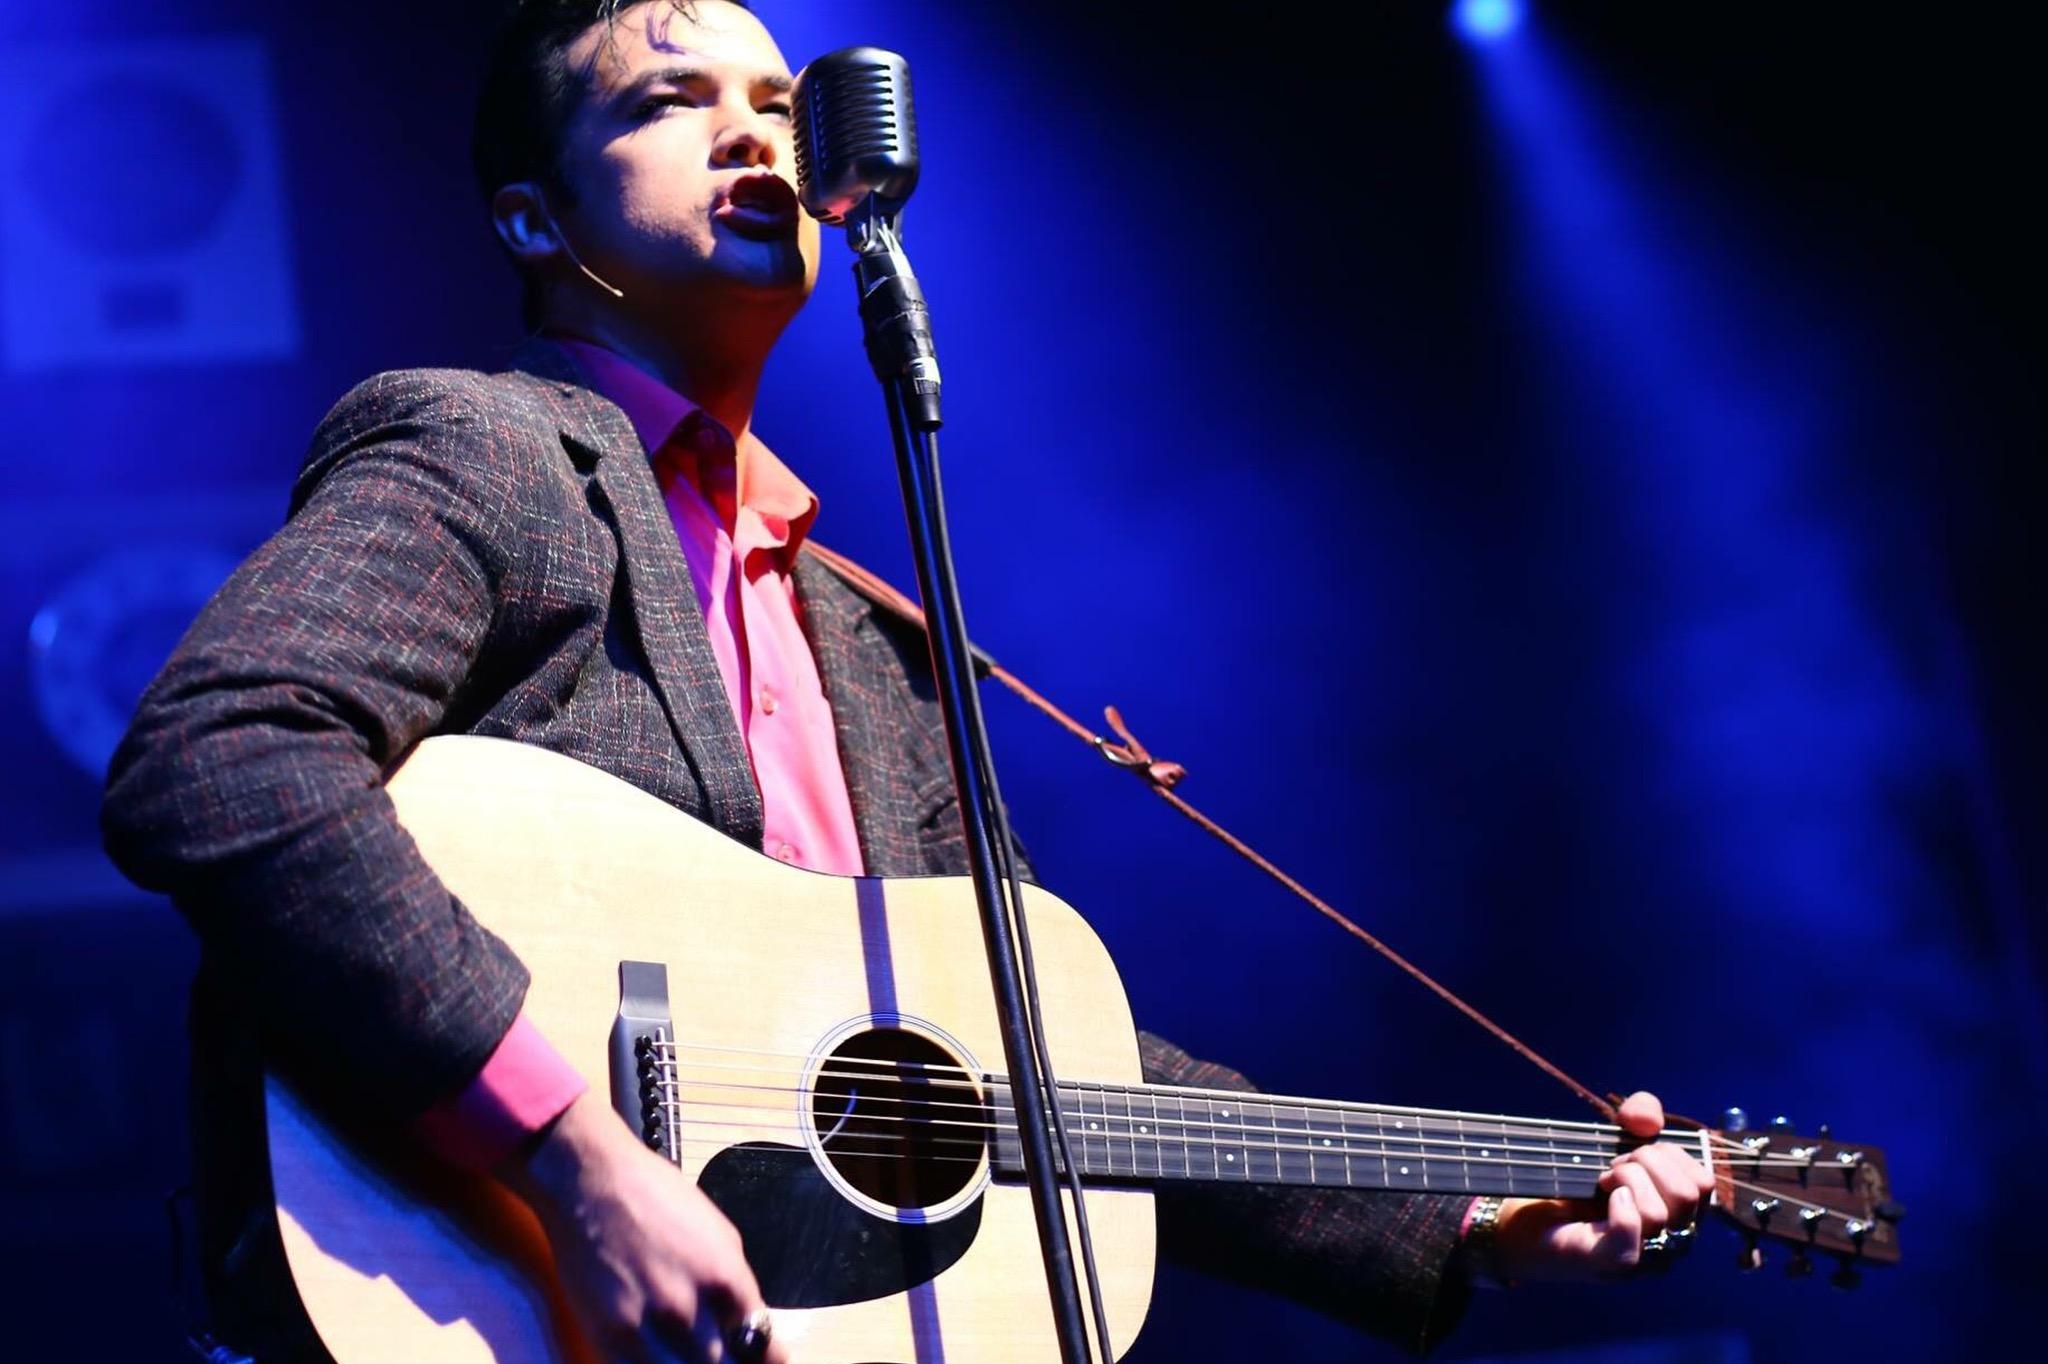 Daniel Durston Elvis Tribute Artist